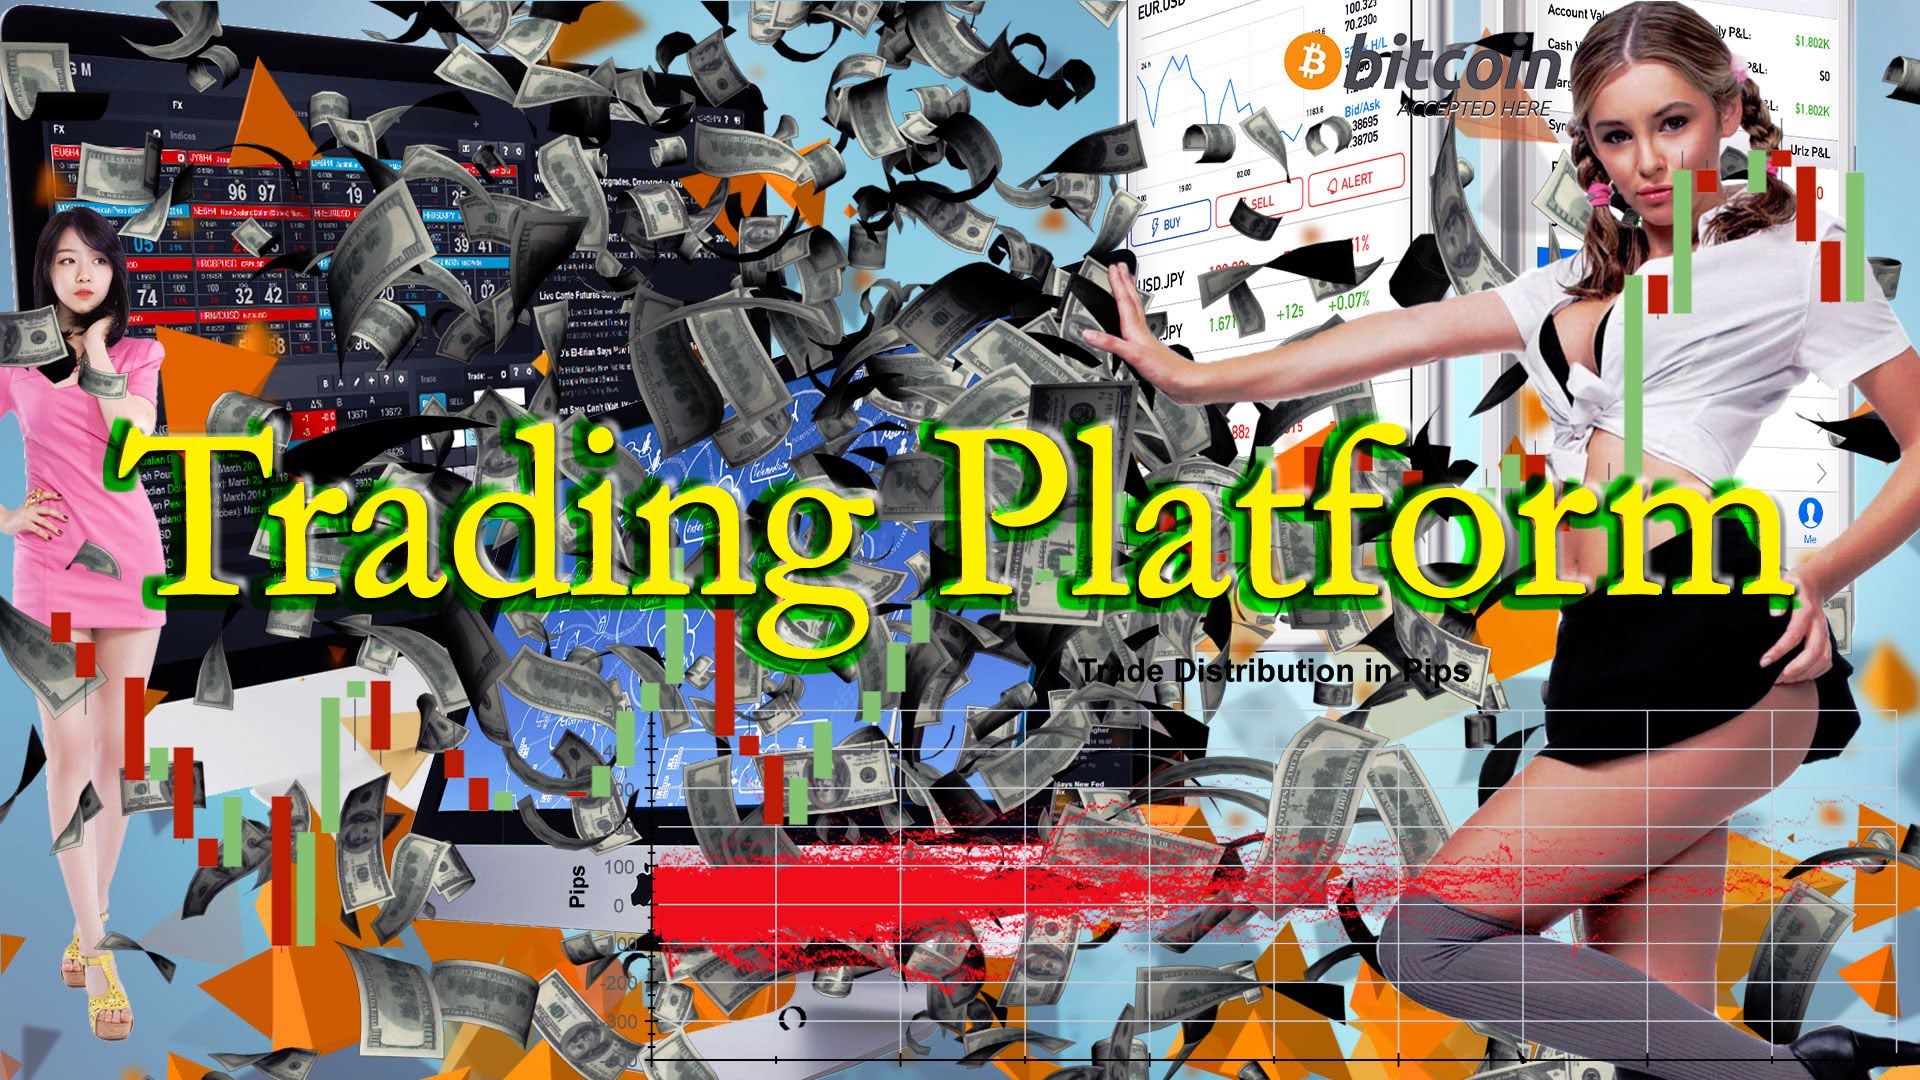 Trading Platform: Best Trading Platform in 2015 | Best Day Trading Software, Tutorial, Reviews